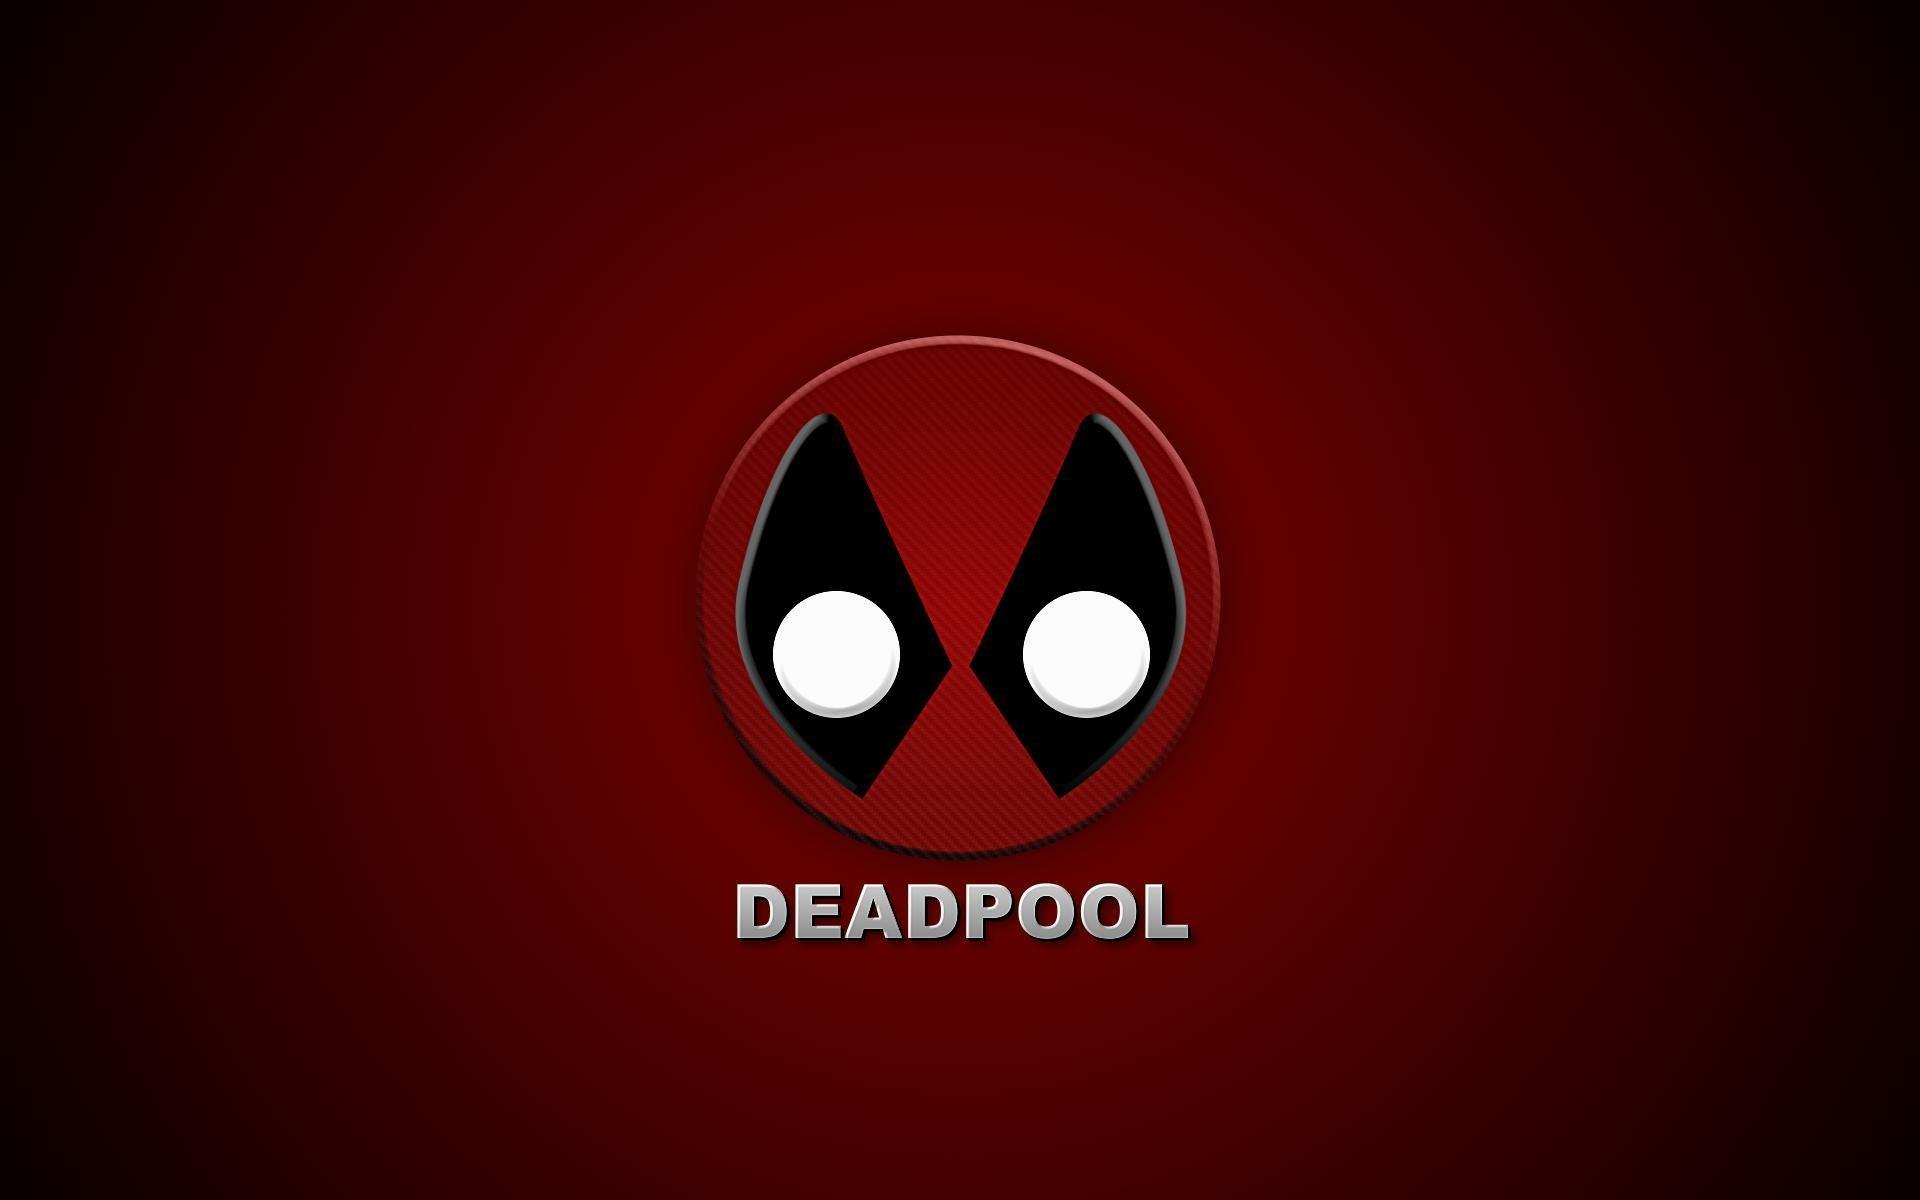 Logo-Deadpool-Wallpapers-free-download